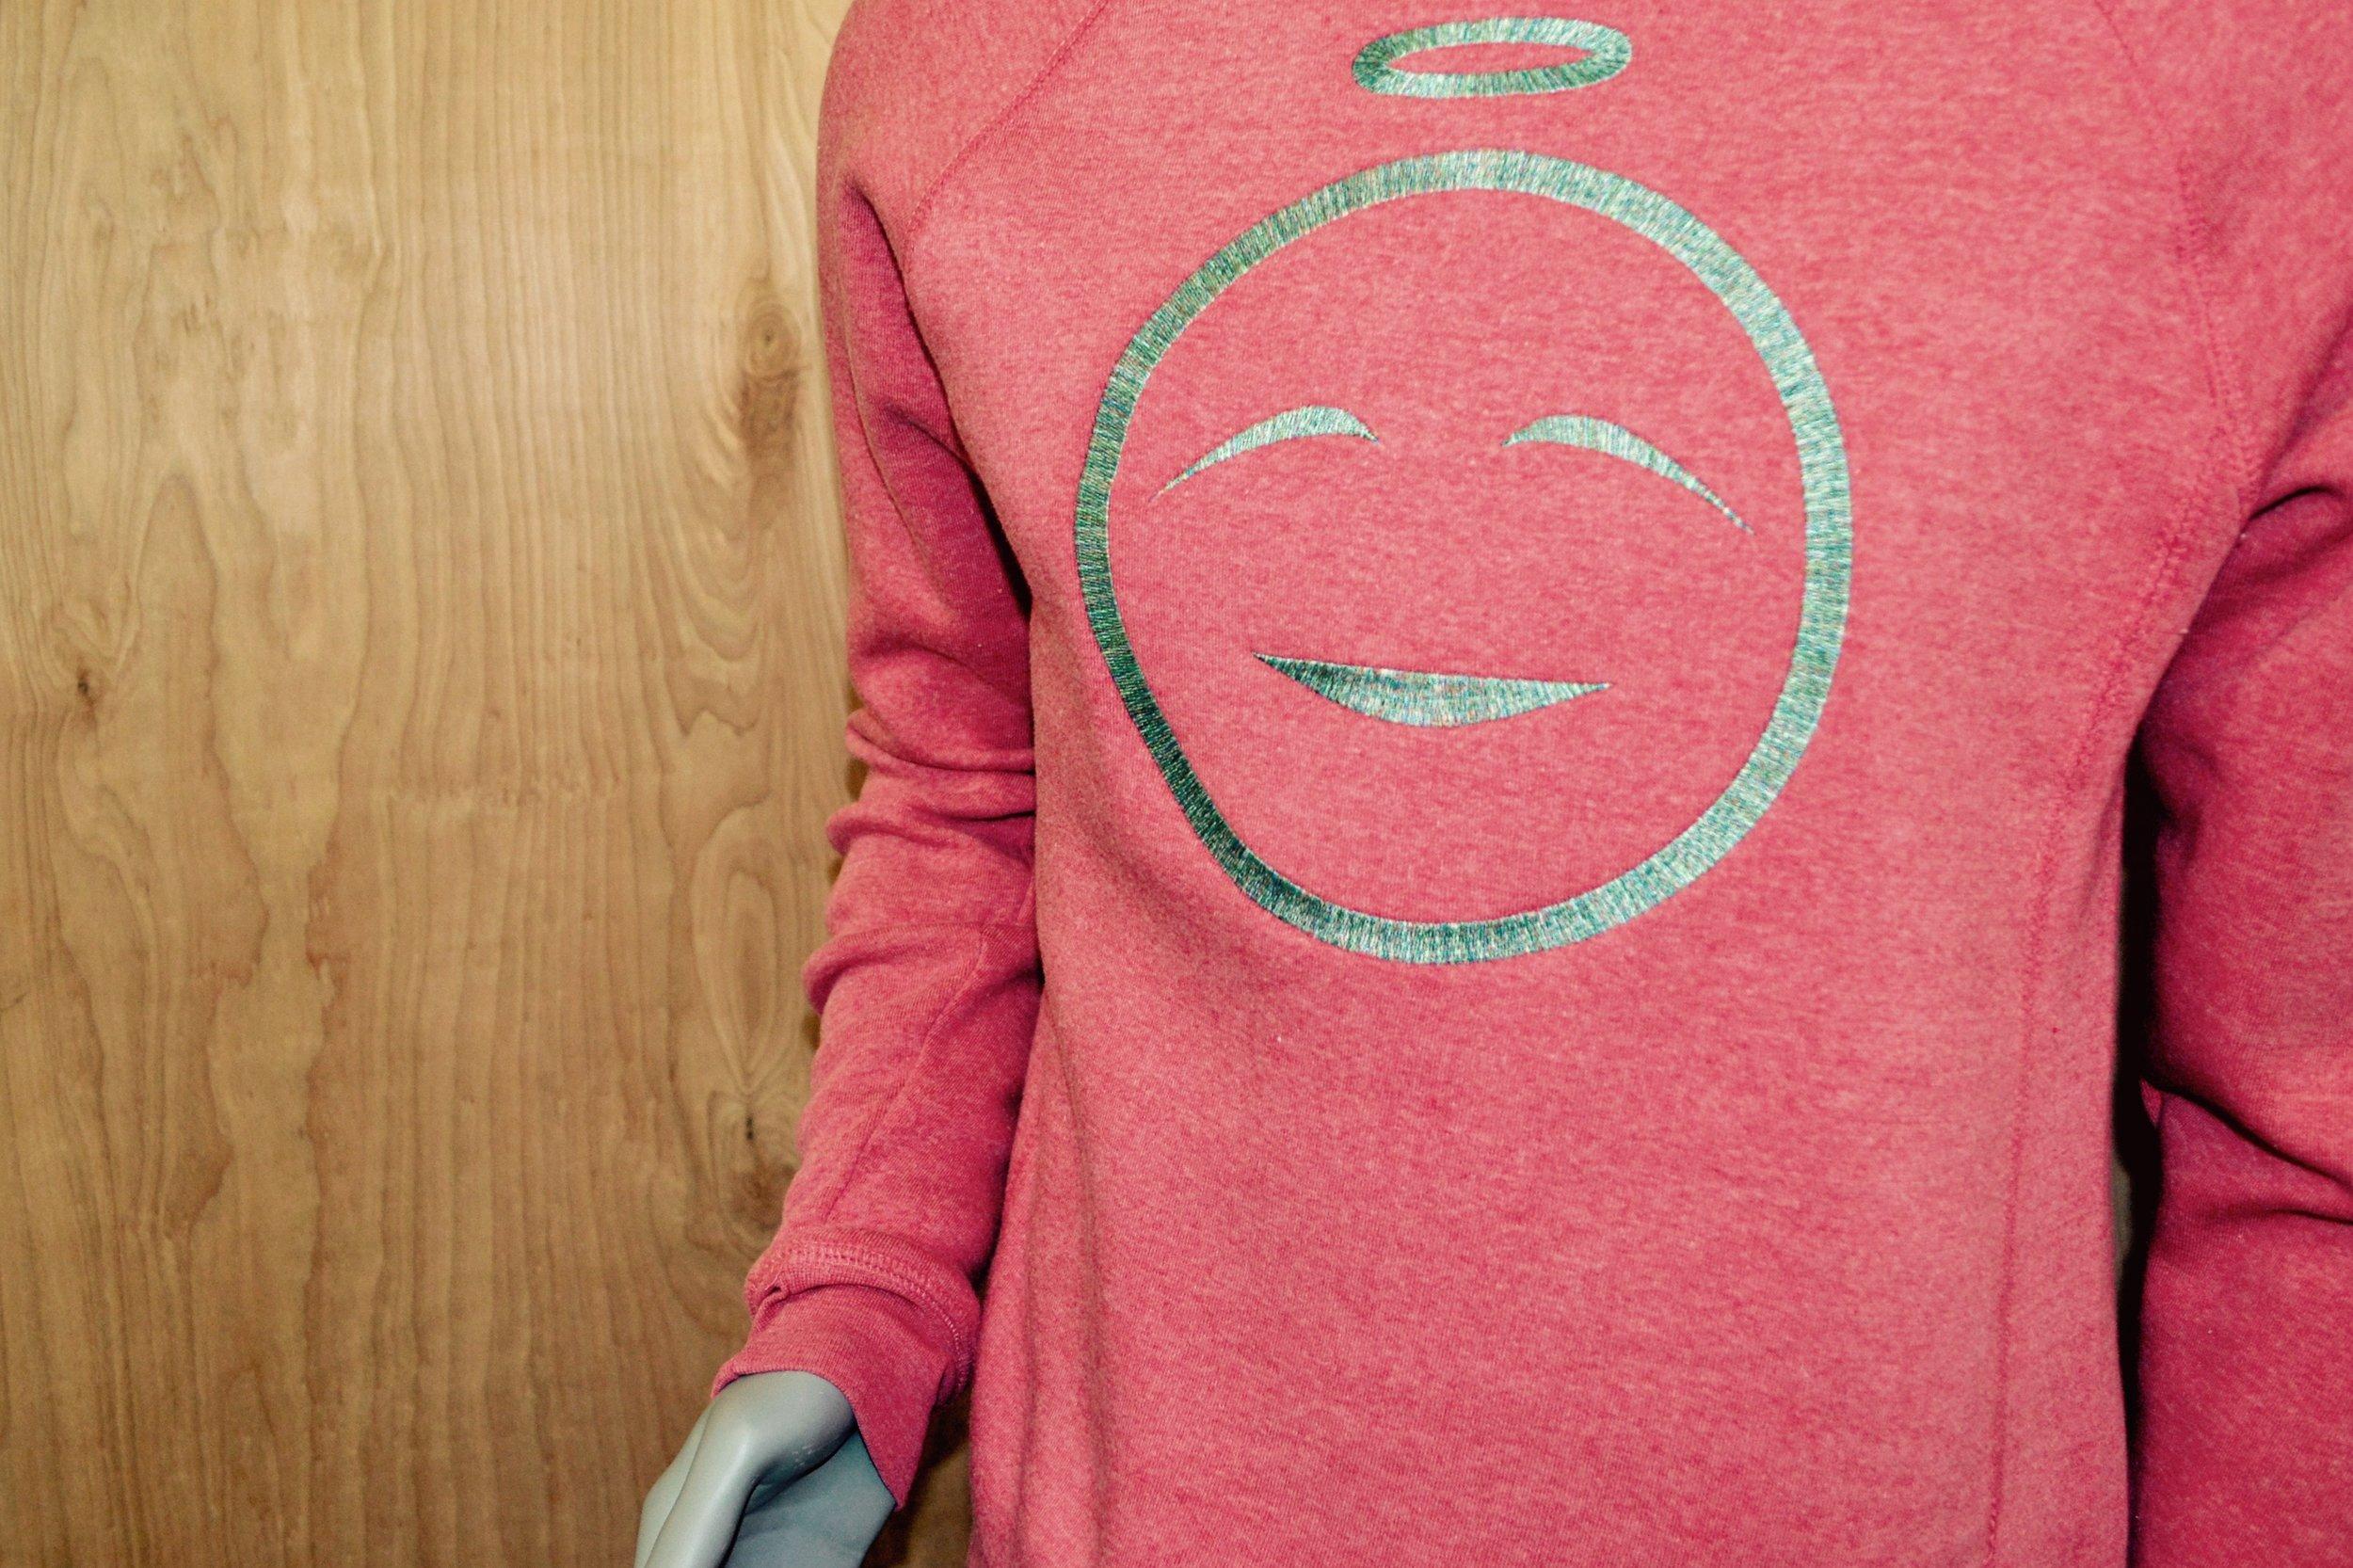 logounltd_laser_etching_embroidery_screen_printing_apparel_uniform_custom_tshirts_kirkland_bellevue_seattle_redmond_woodinville_branded_merchandise_promotional_products_logo_unltd_ tshirts_design_custom_tmobil (9).jpg